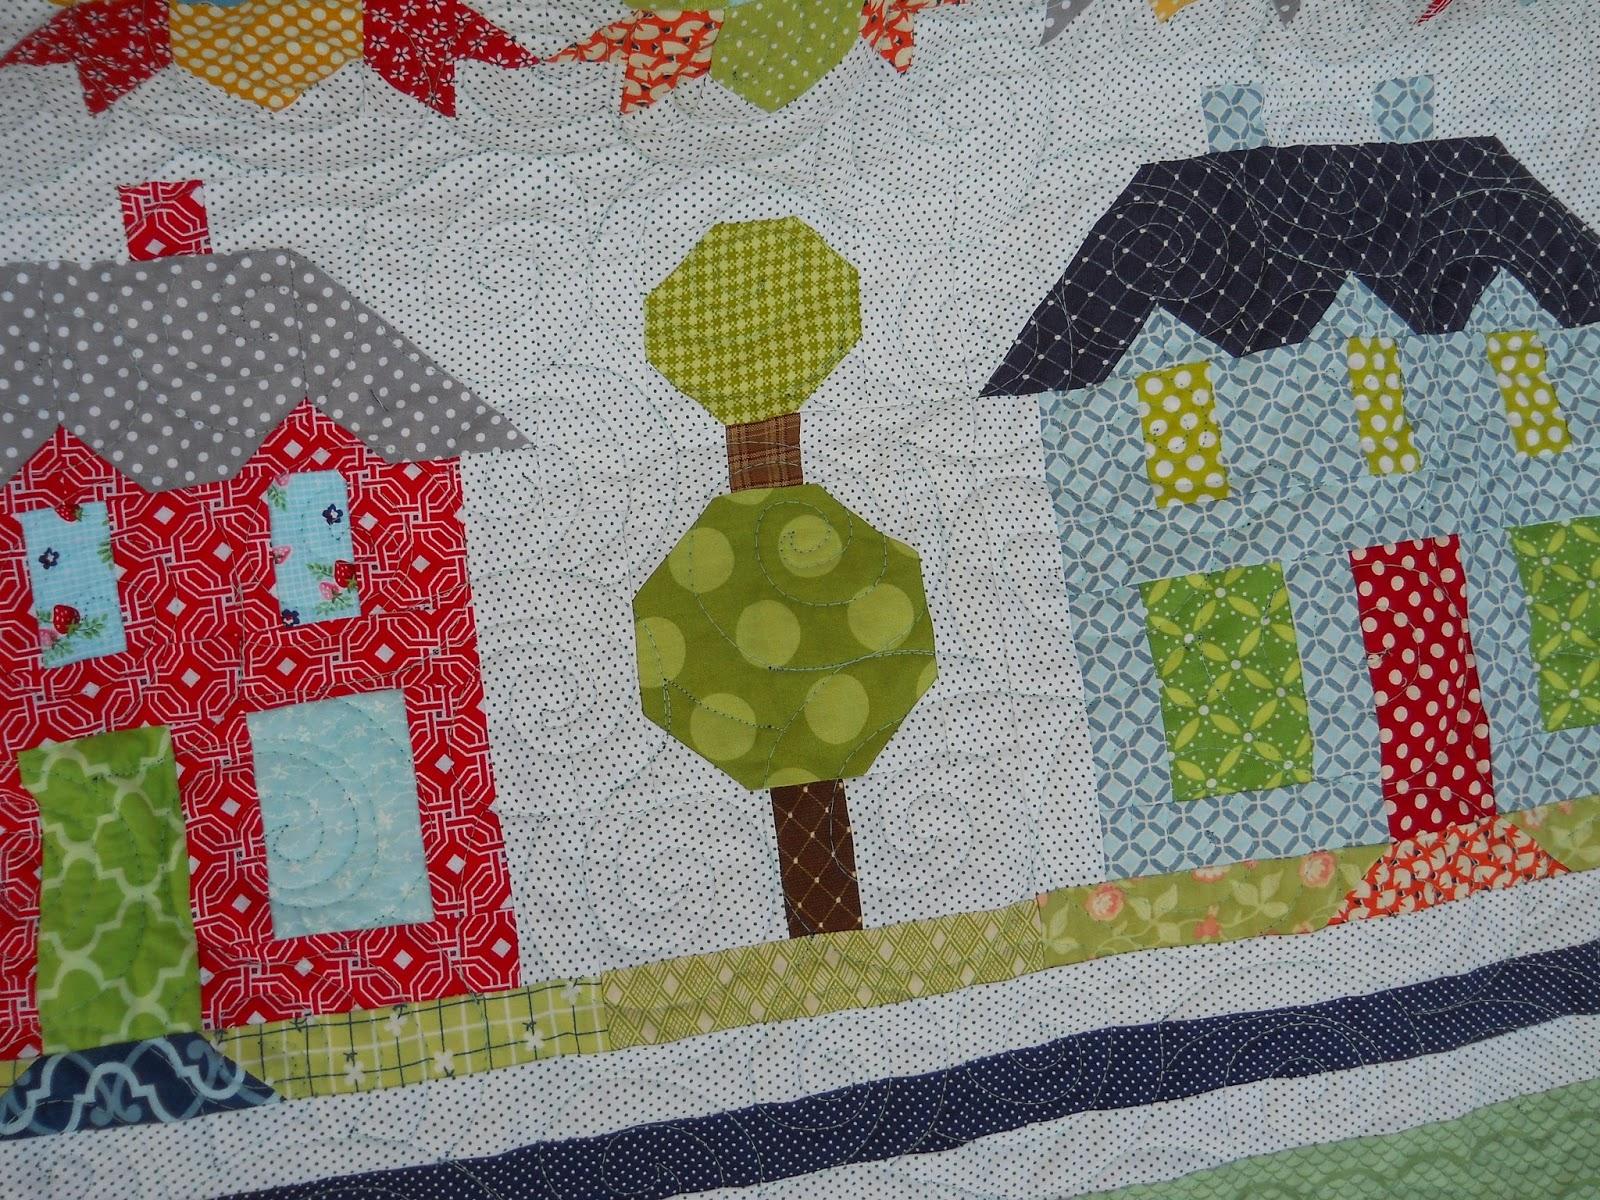 Polka Dot Quilter: Farm House Lane Quilt from Farm Girl Vintage Book : the quilt farm - Adamdwight.com